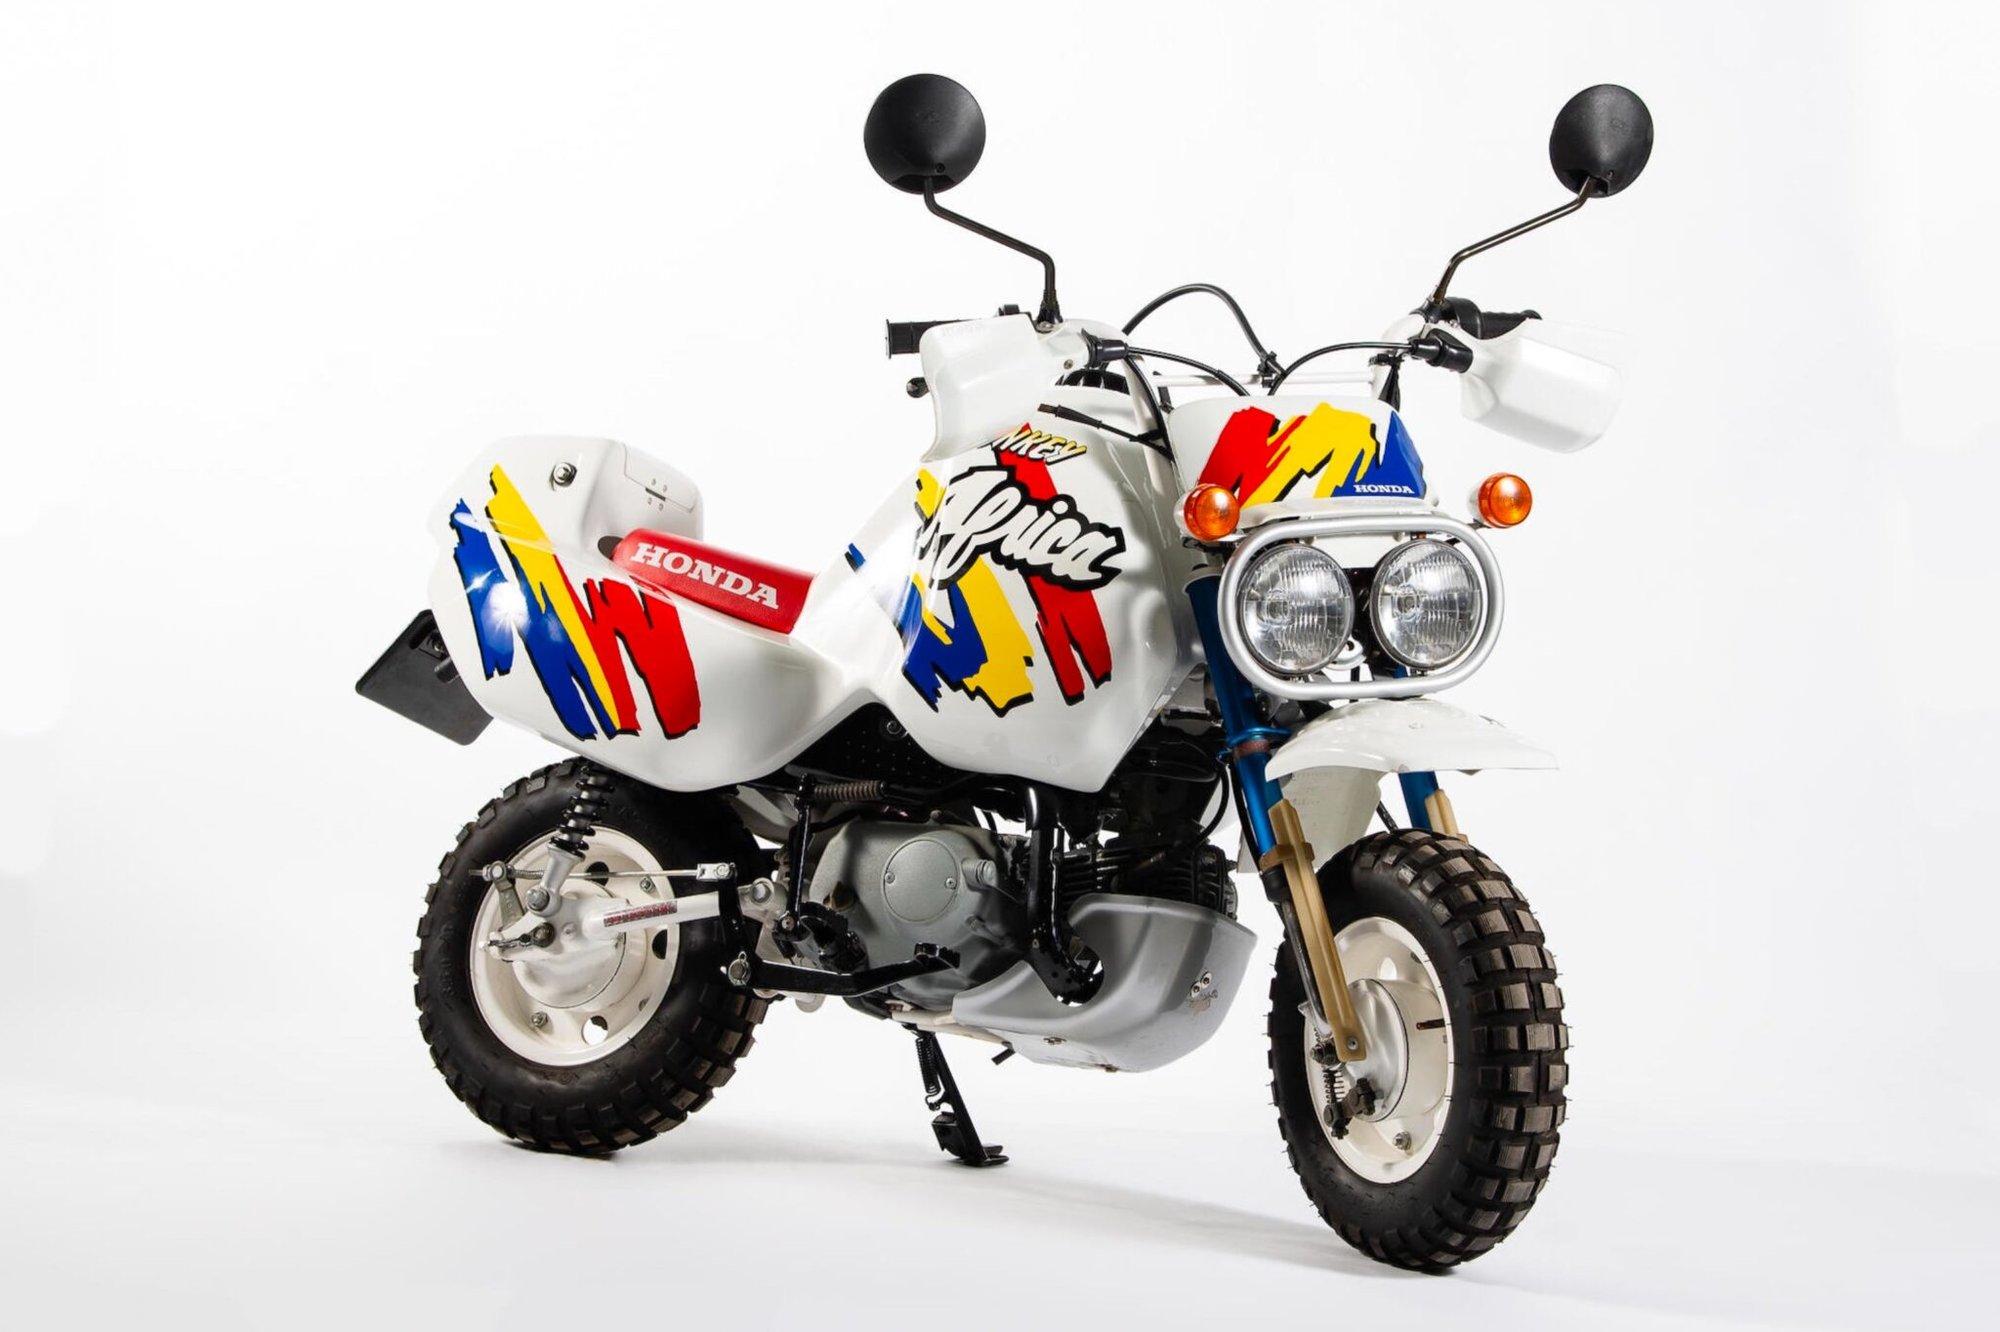 Honda-Z50J-Monkey-Baja-Africa-2048x1364.jpg